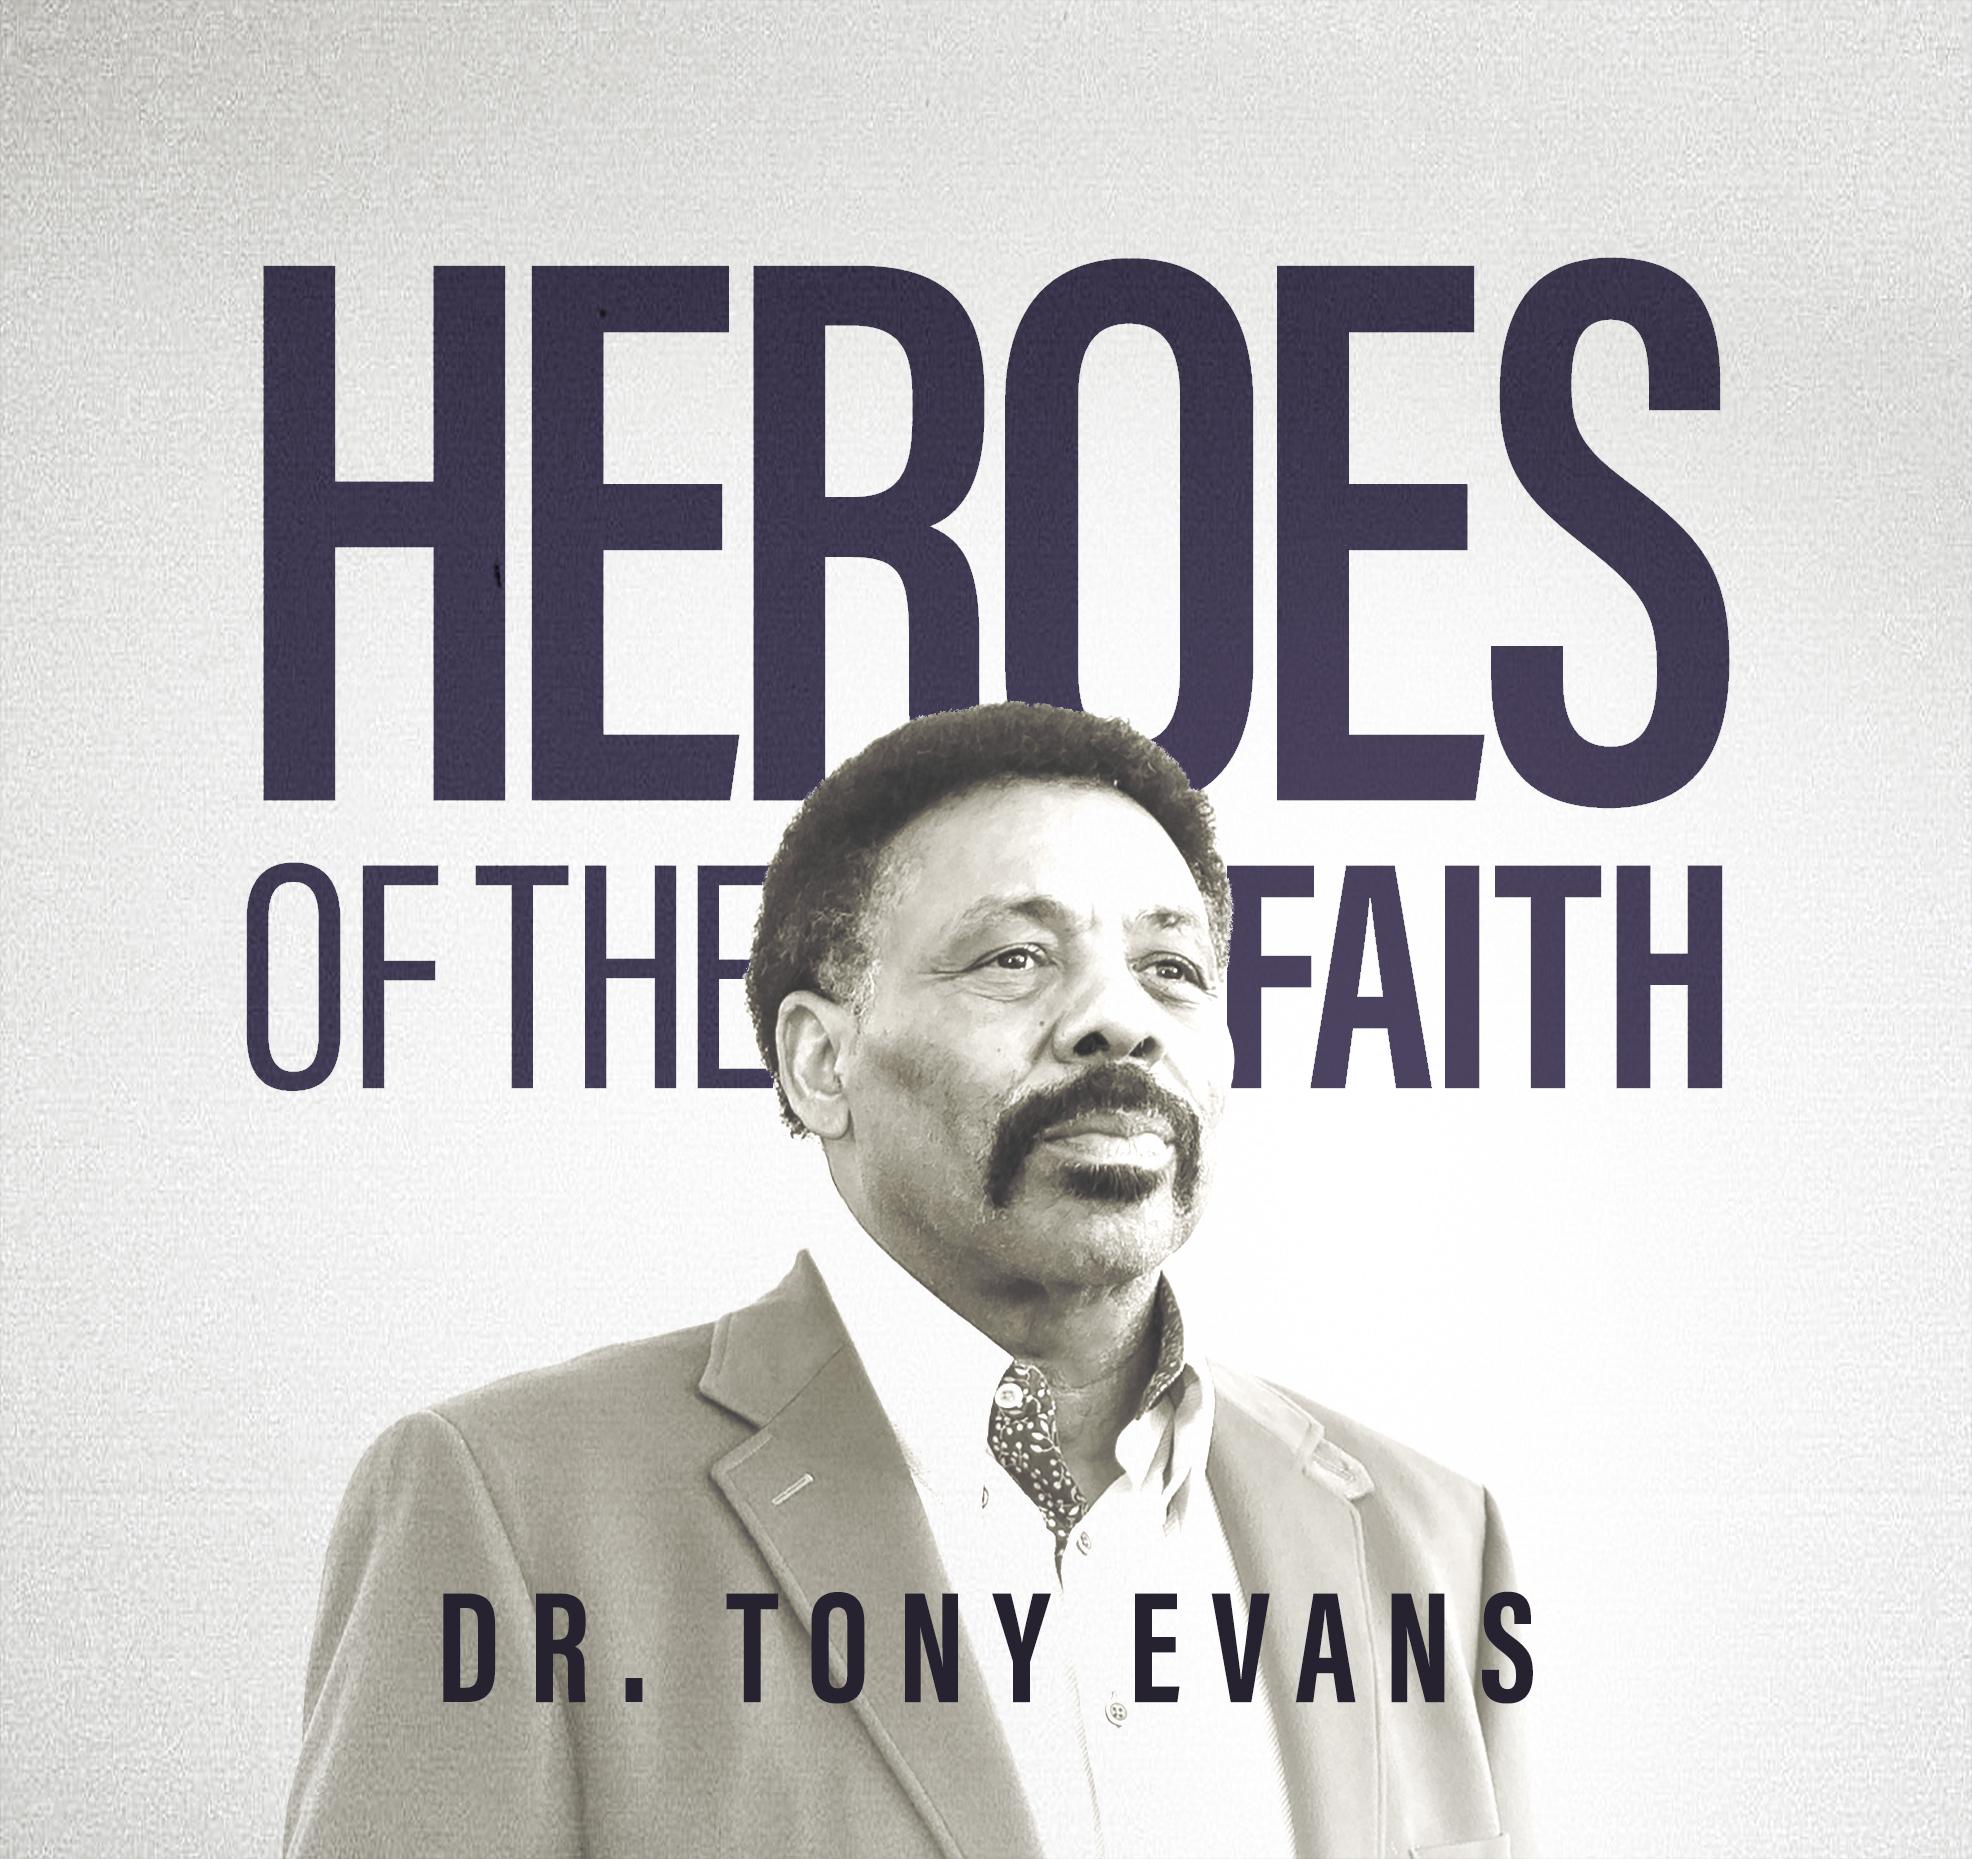 Heroes of the Faith Vol 1 DVD Series